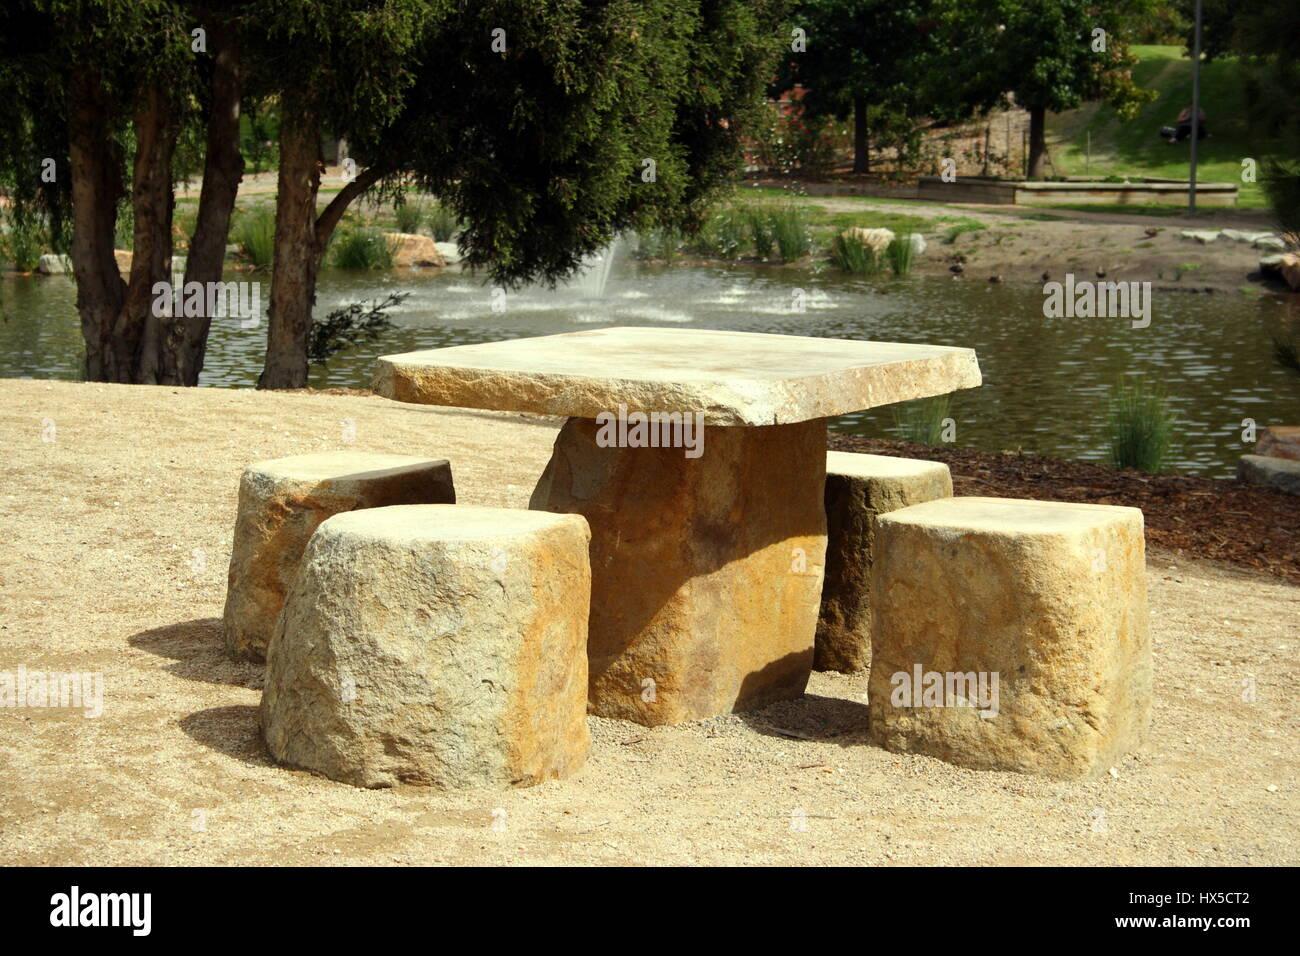 Stone Picnic Setting In A Public Park   Stock Image